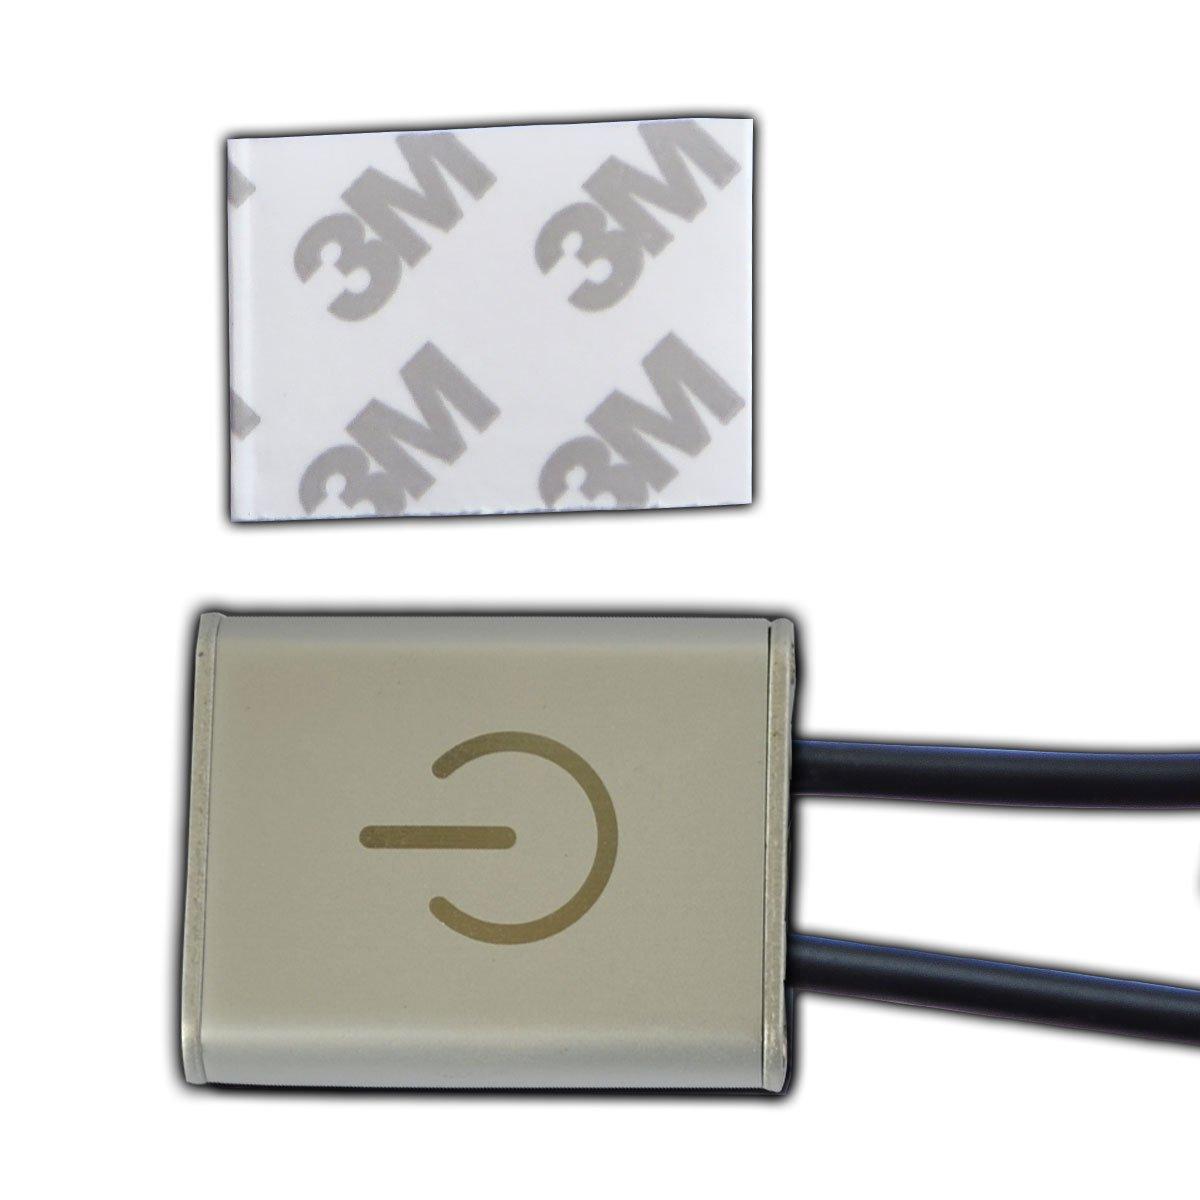 etc. PB-Versand Conmutador de luz LED mediante tecnolog/ía t/áctil para regular las barras de luz LED